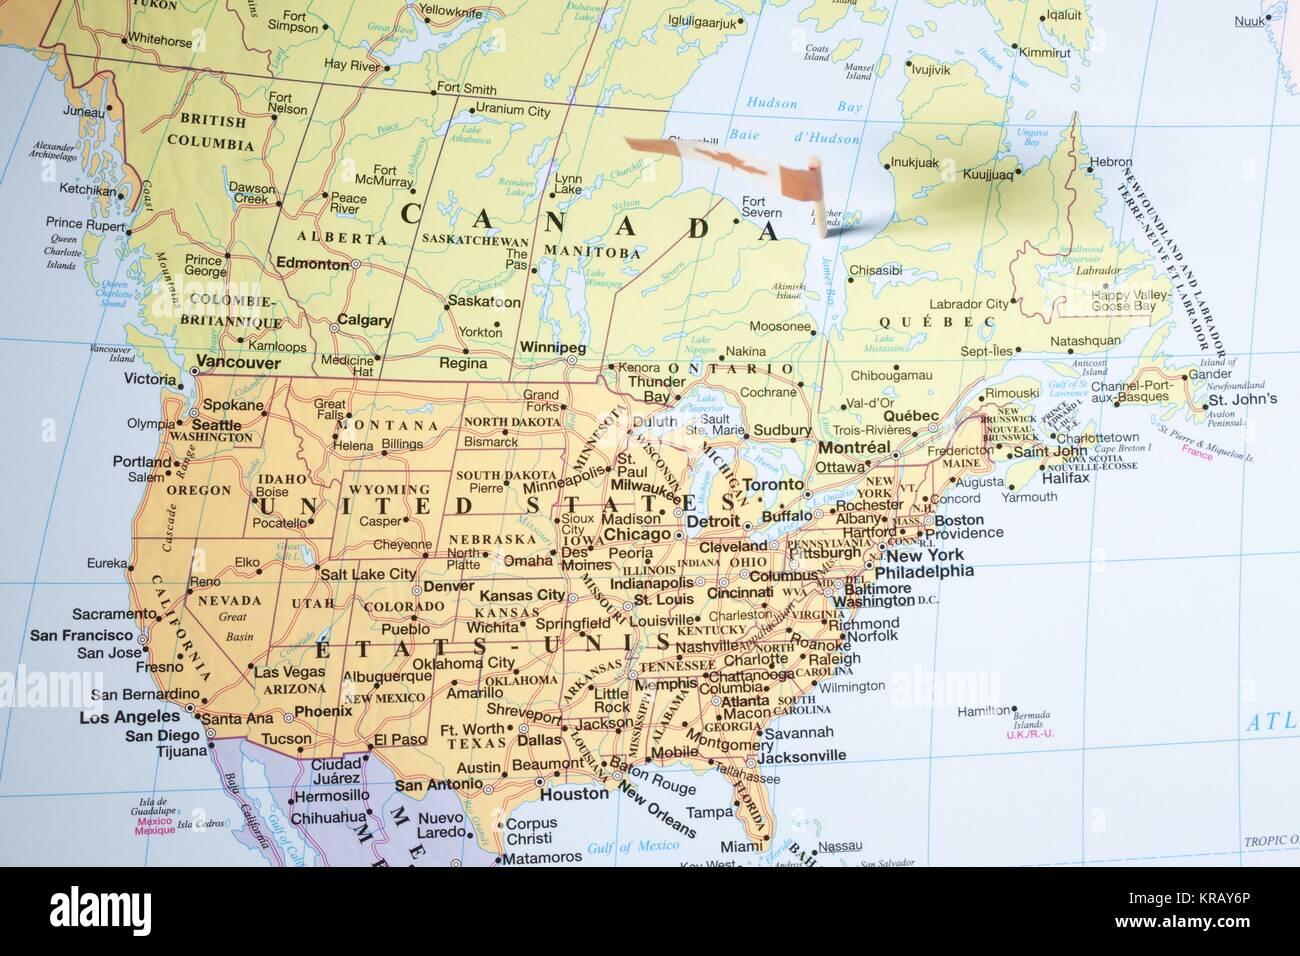 Close Up Shot Of United States Map Stock Photo 169271278 Alamy - Us-map-close-up